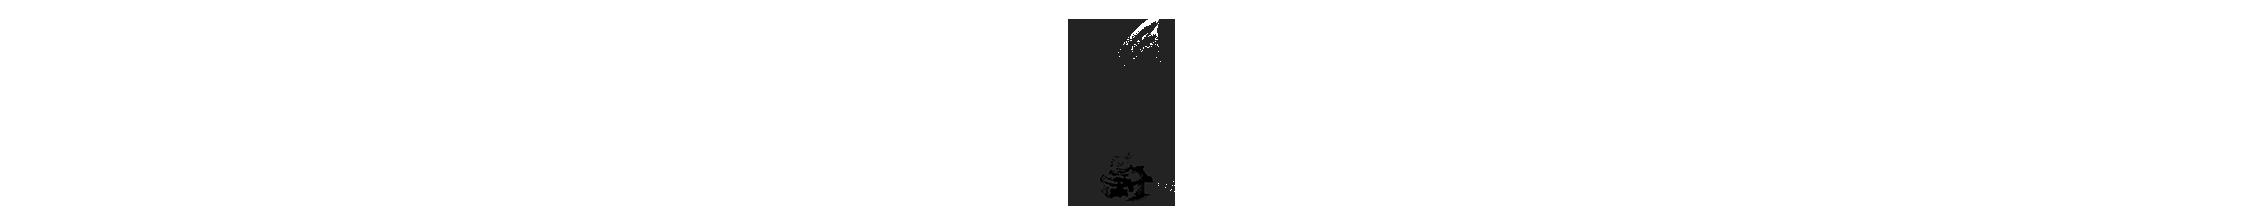 prismawedding ilustracion .png